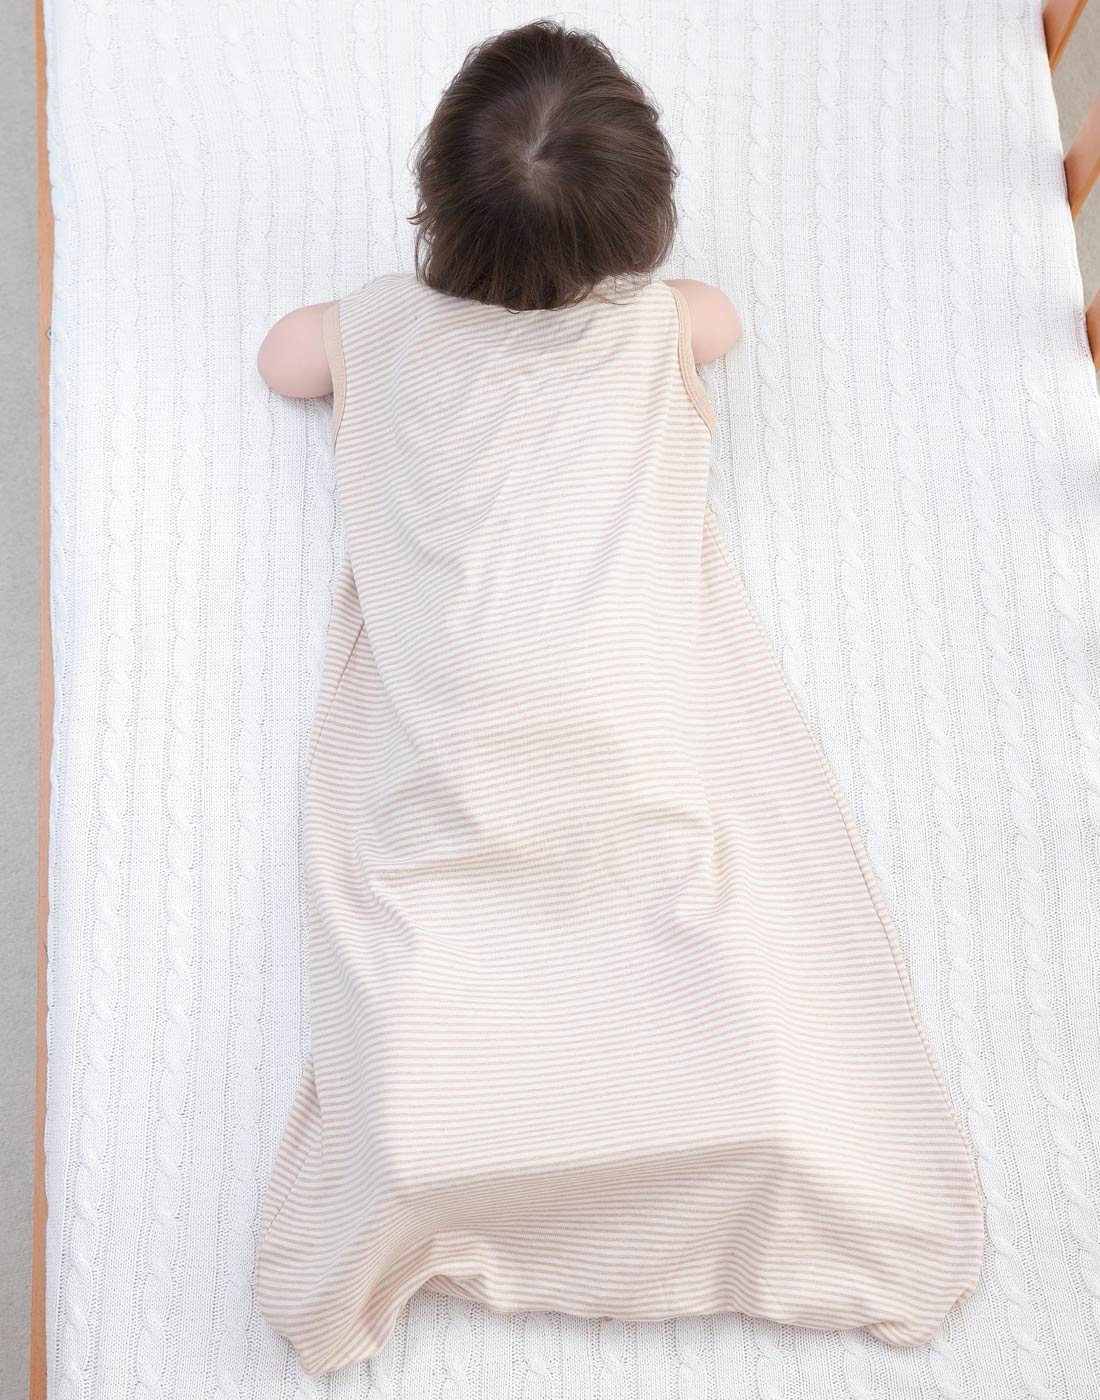 Happy Cherry – Saco de Dormir para Bebés de Verano sin Mangas de Algodón Bolsa de Dormir para Niños con Tres Aberturas Transpirable Slepping Bag bebé – Marrón – 5-36 Meses